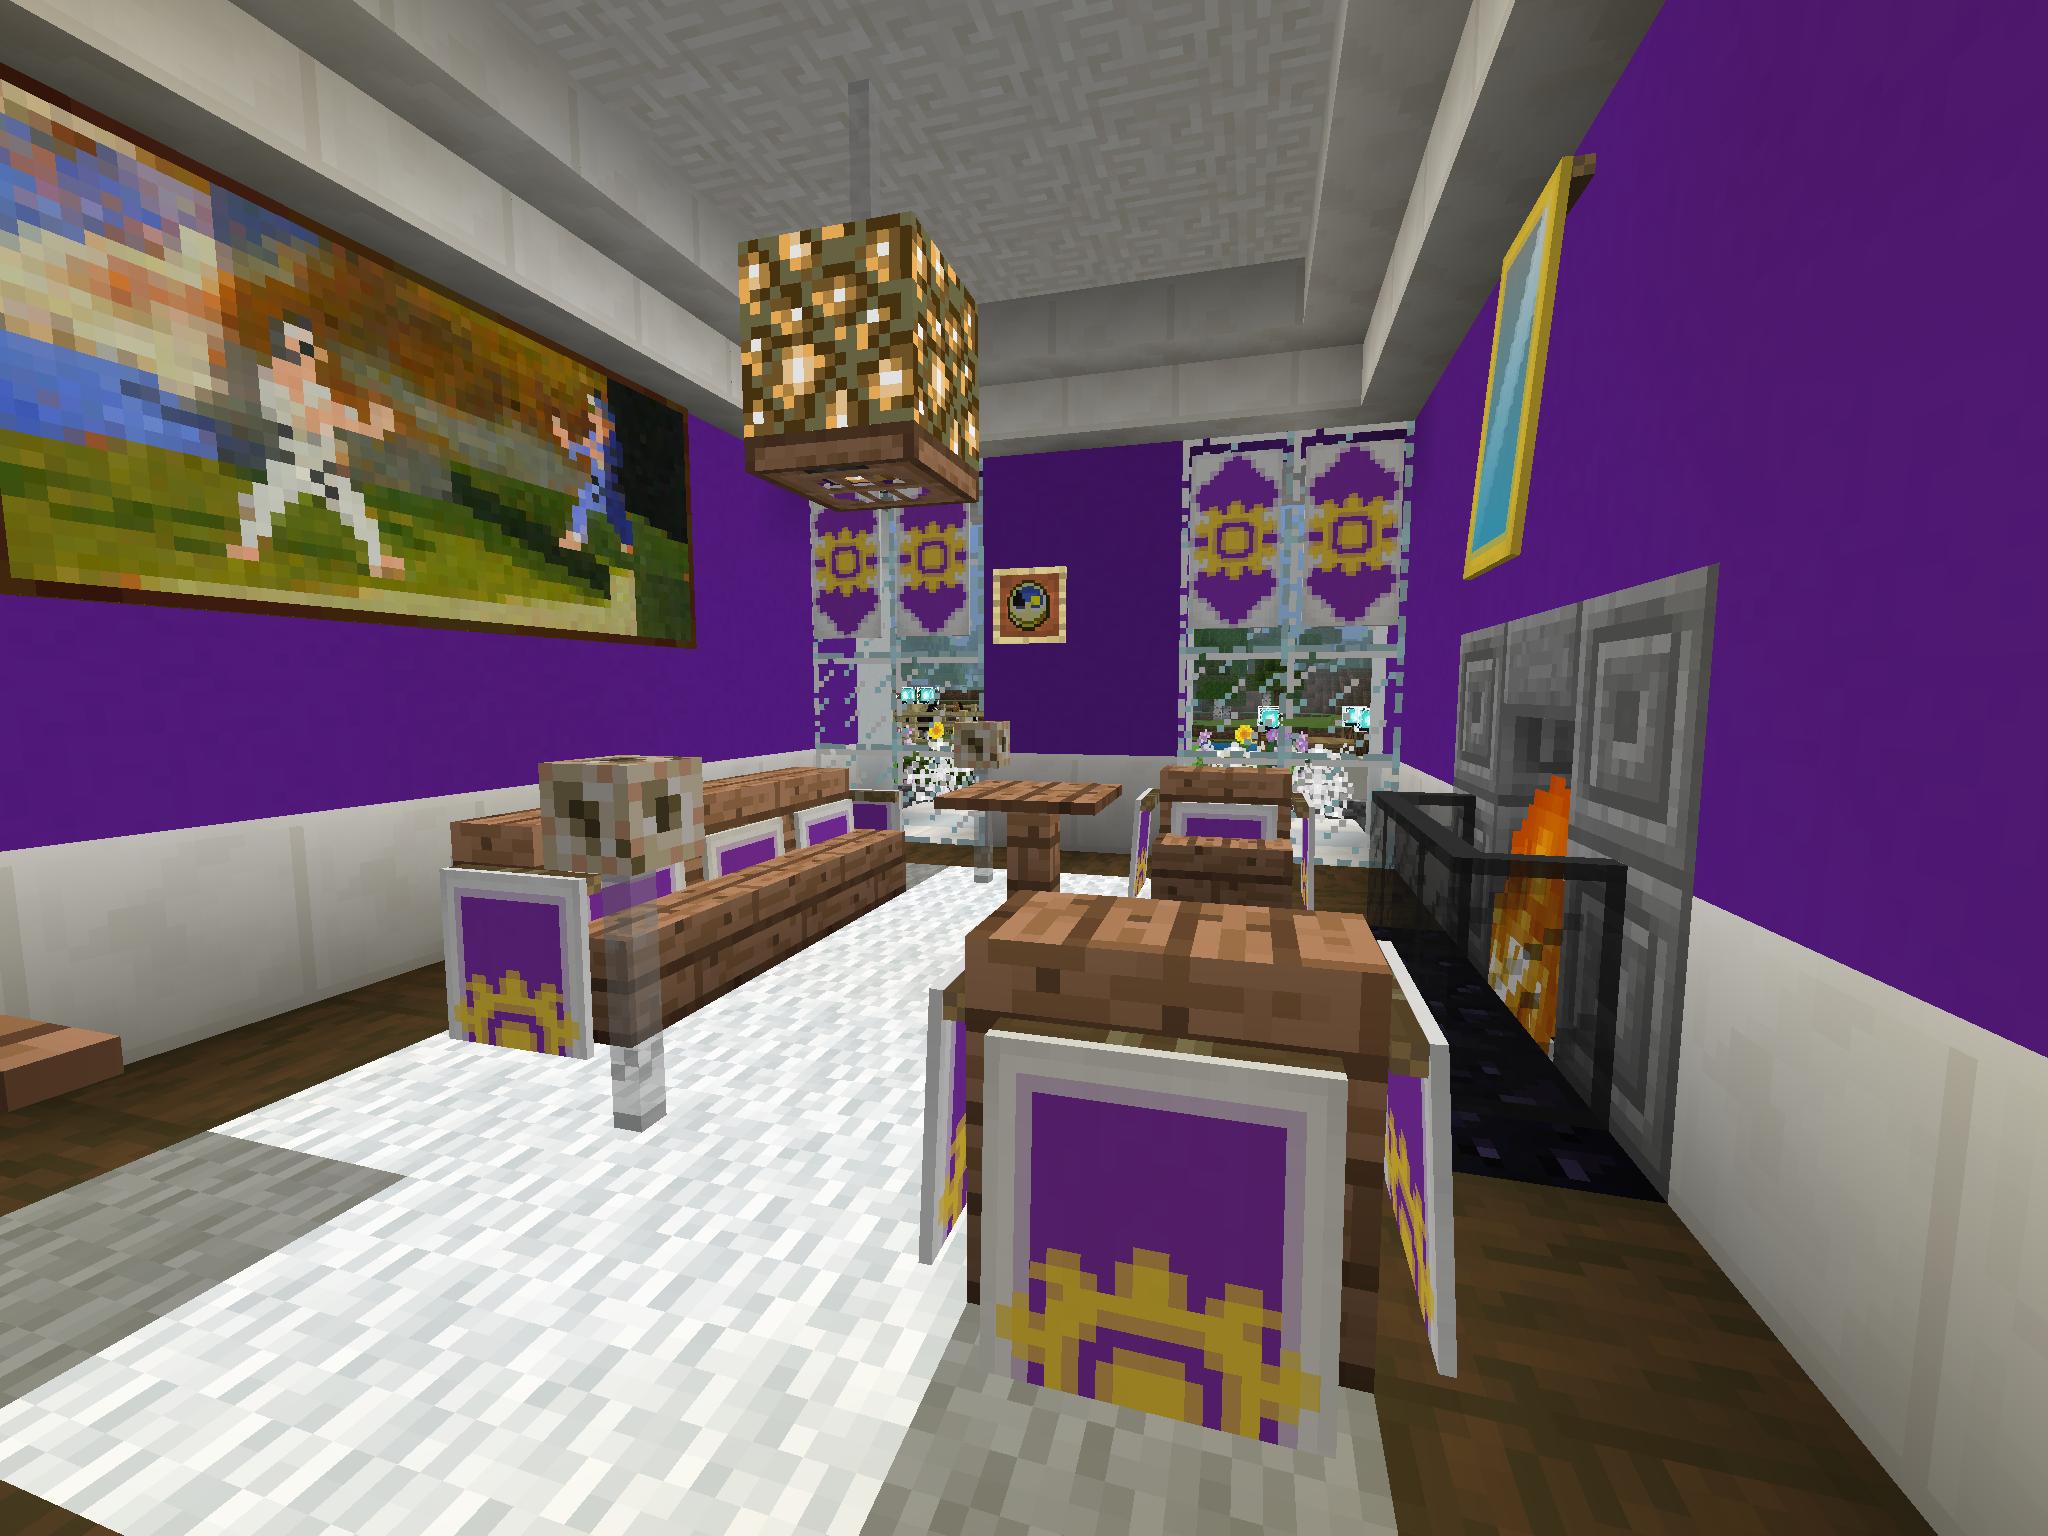 Minecraft Interior Design: 15+ Creative & Simple Minecraft ... |Minecraft Mansion Inside Bedroom